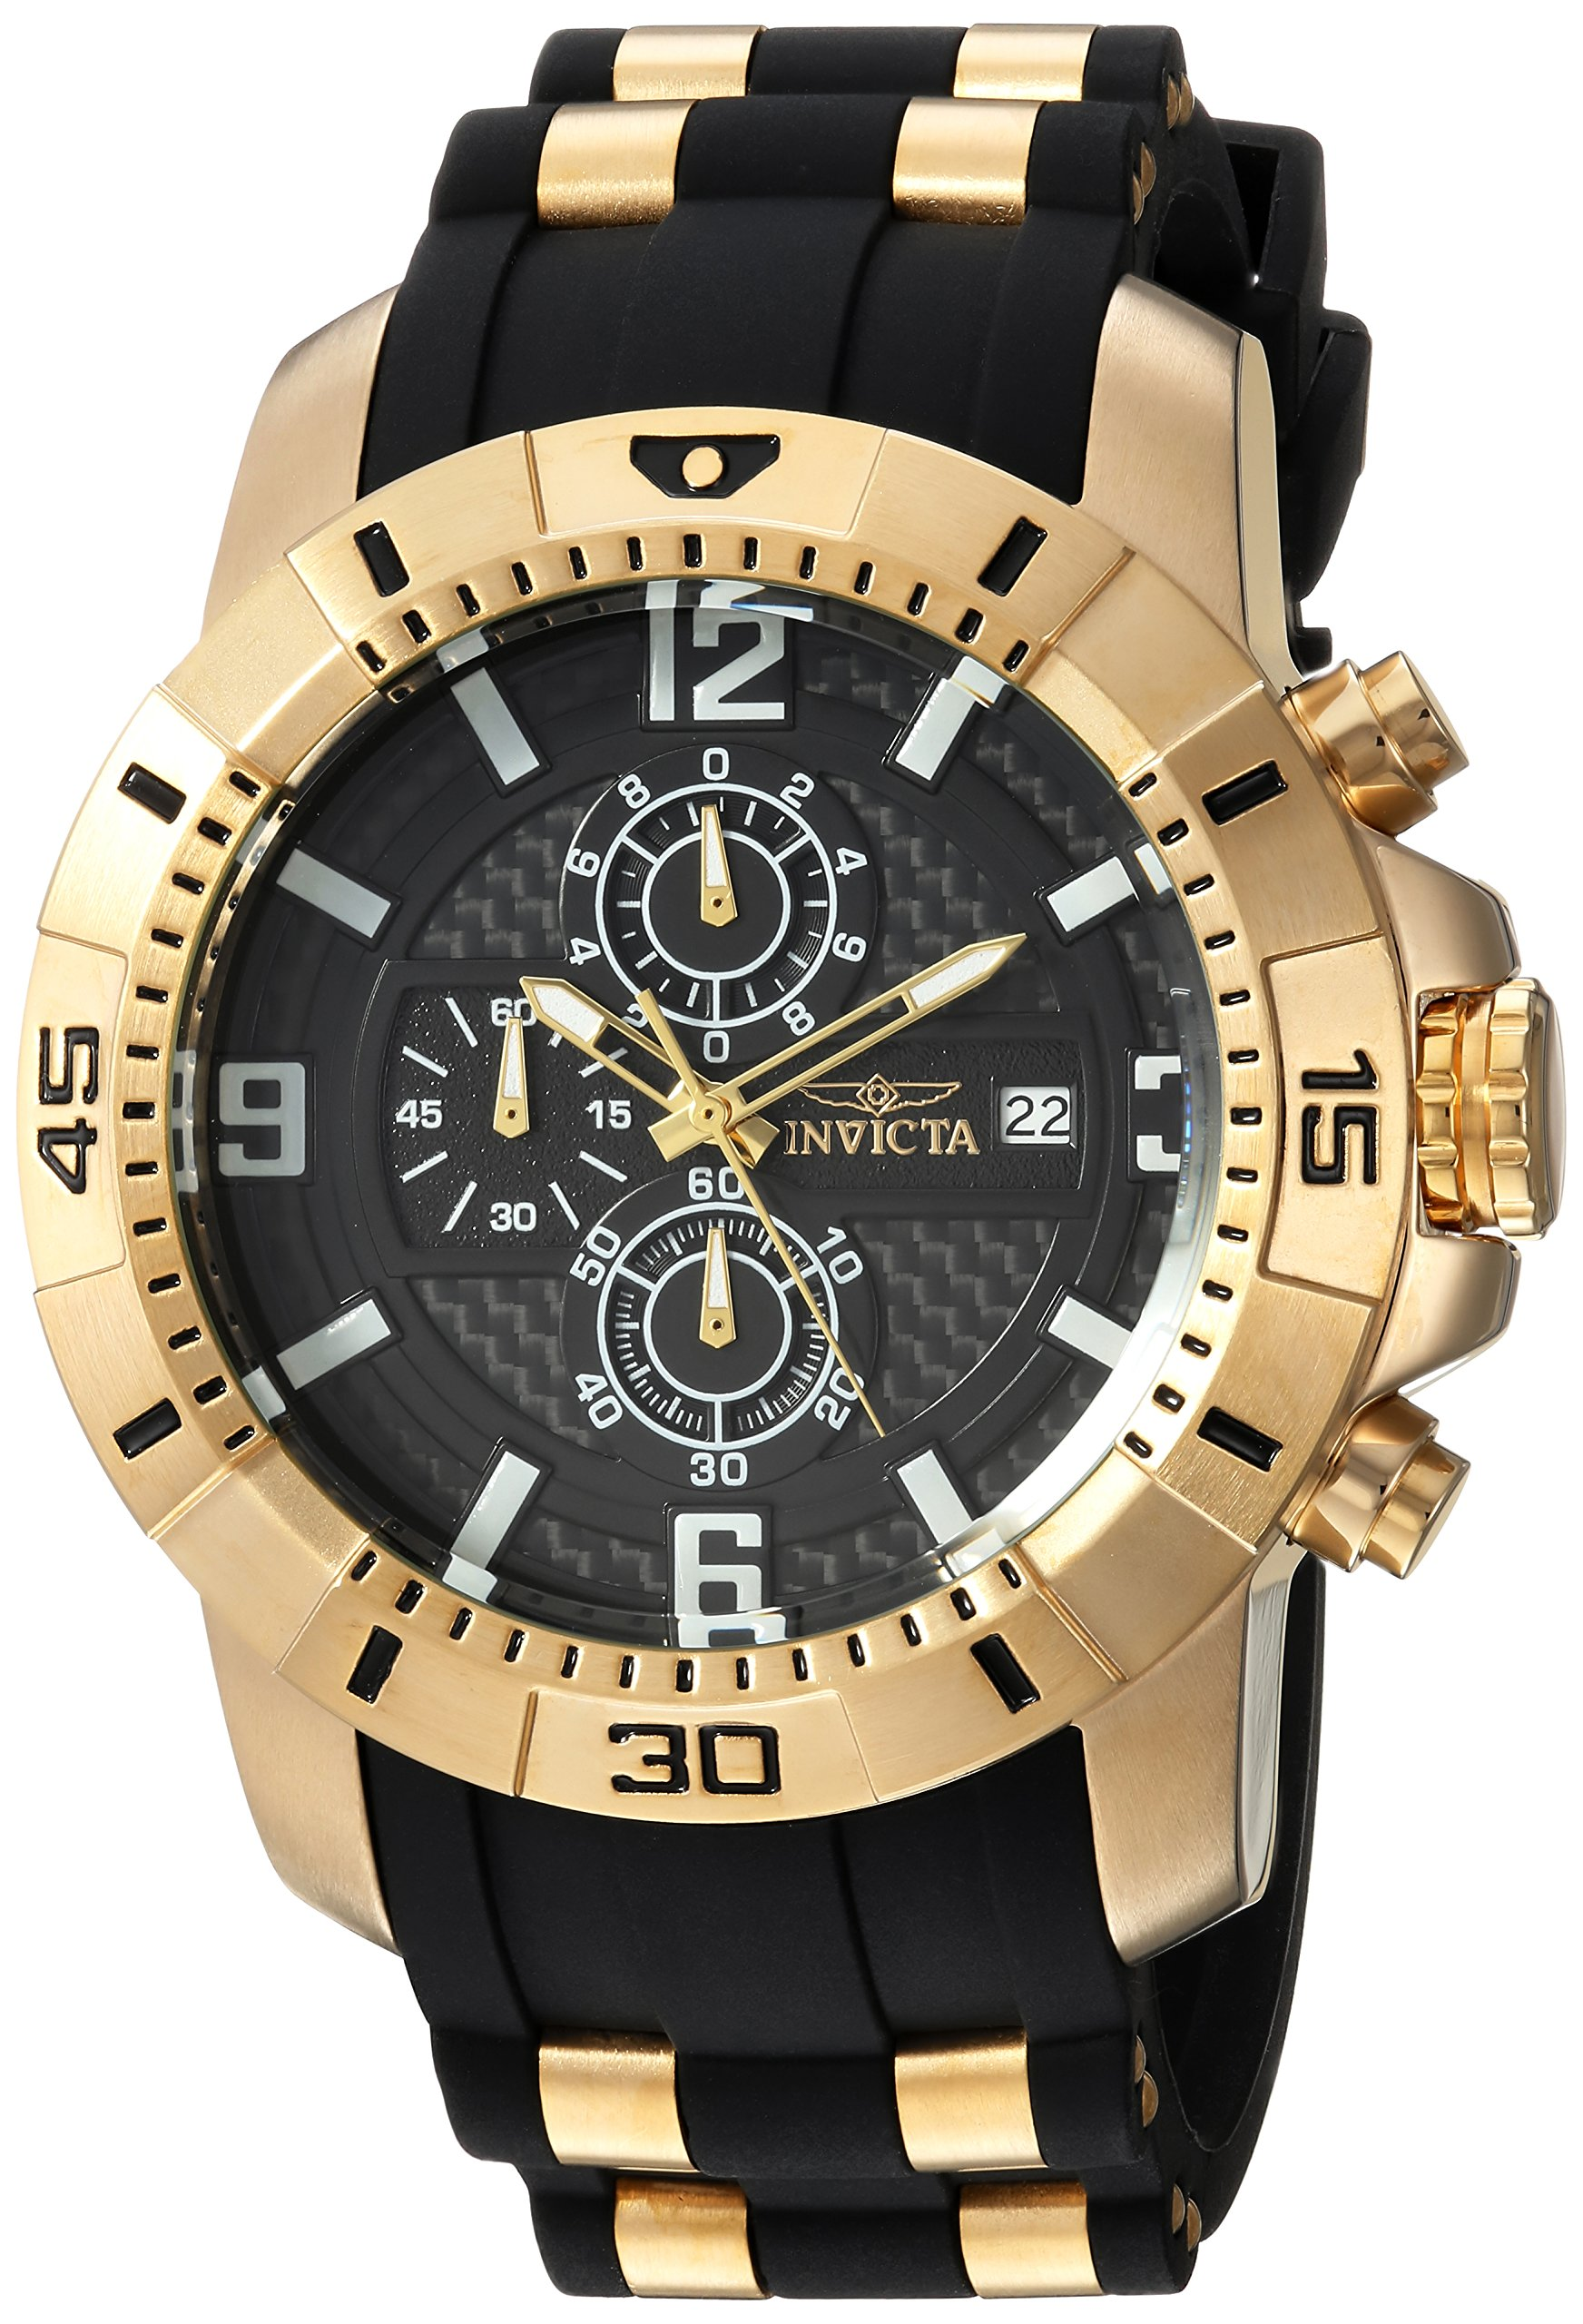 Invicta Men's Pro Diver Quartz Watch with Stainless-Steel & Silicone Strap Blue/Black